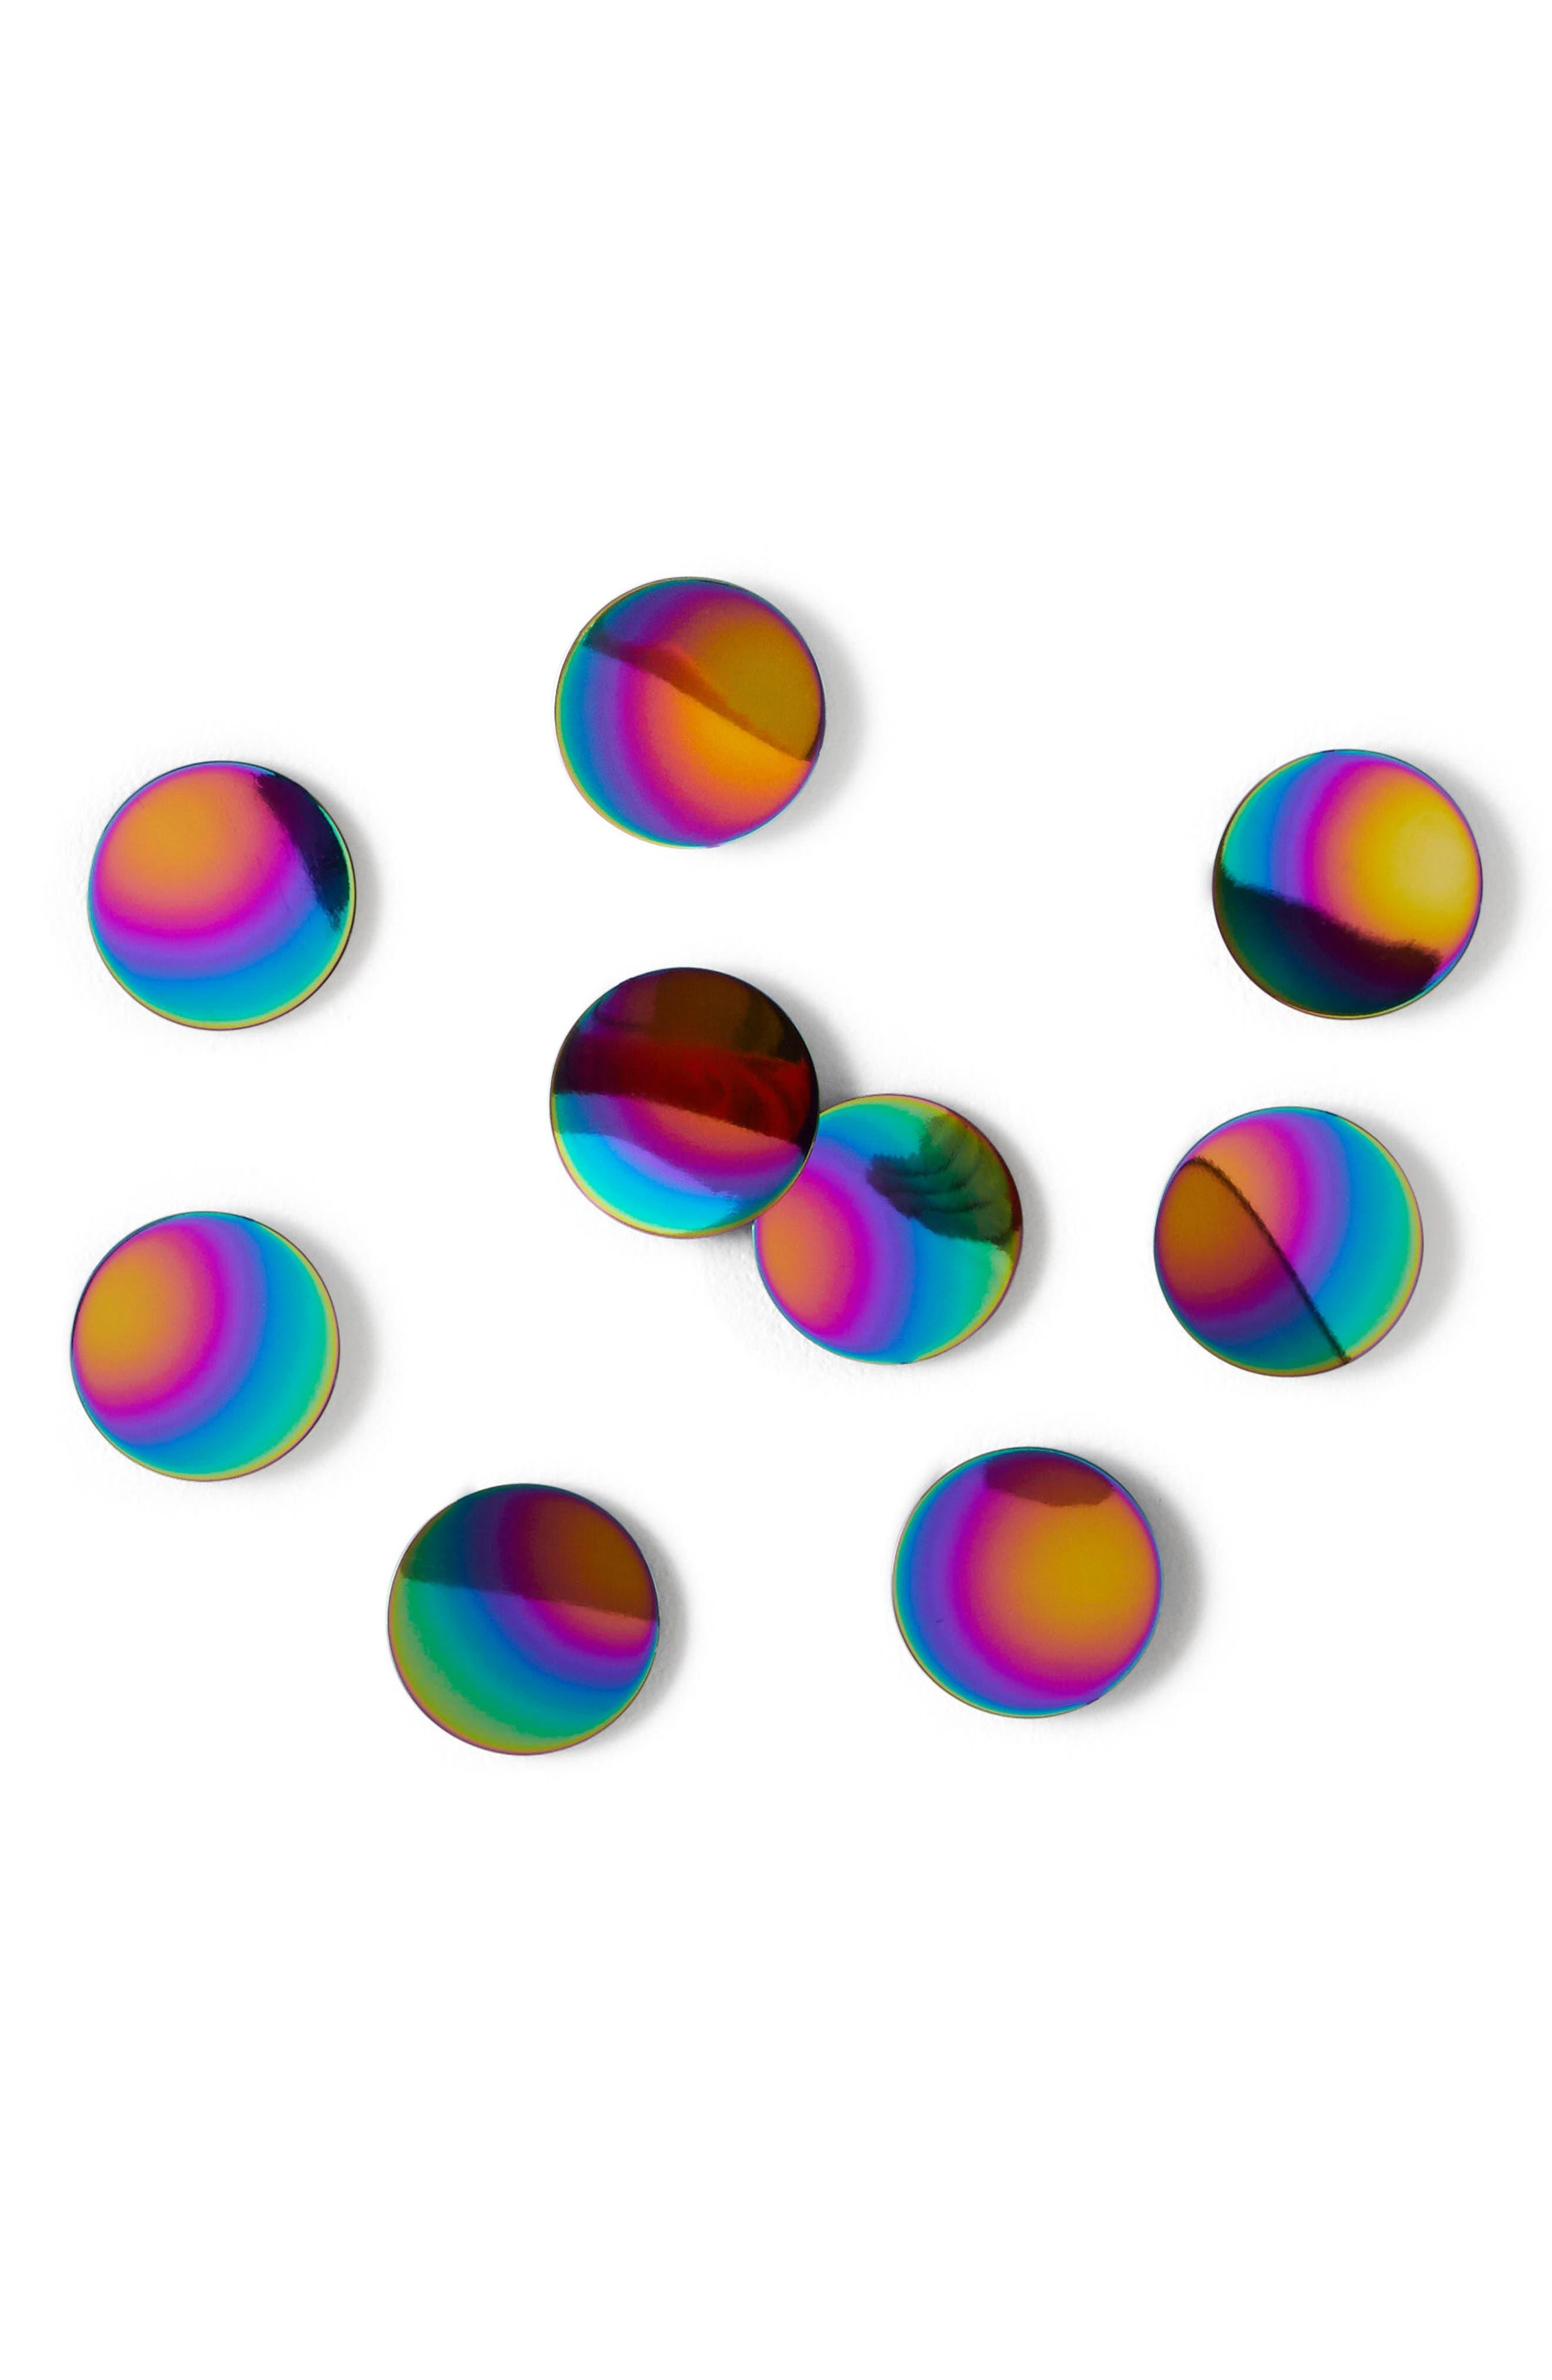 3D Confetti Dot Set of 10 Wall Decals,                             Main thumbnail 1, color,                             Rainbow